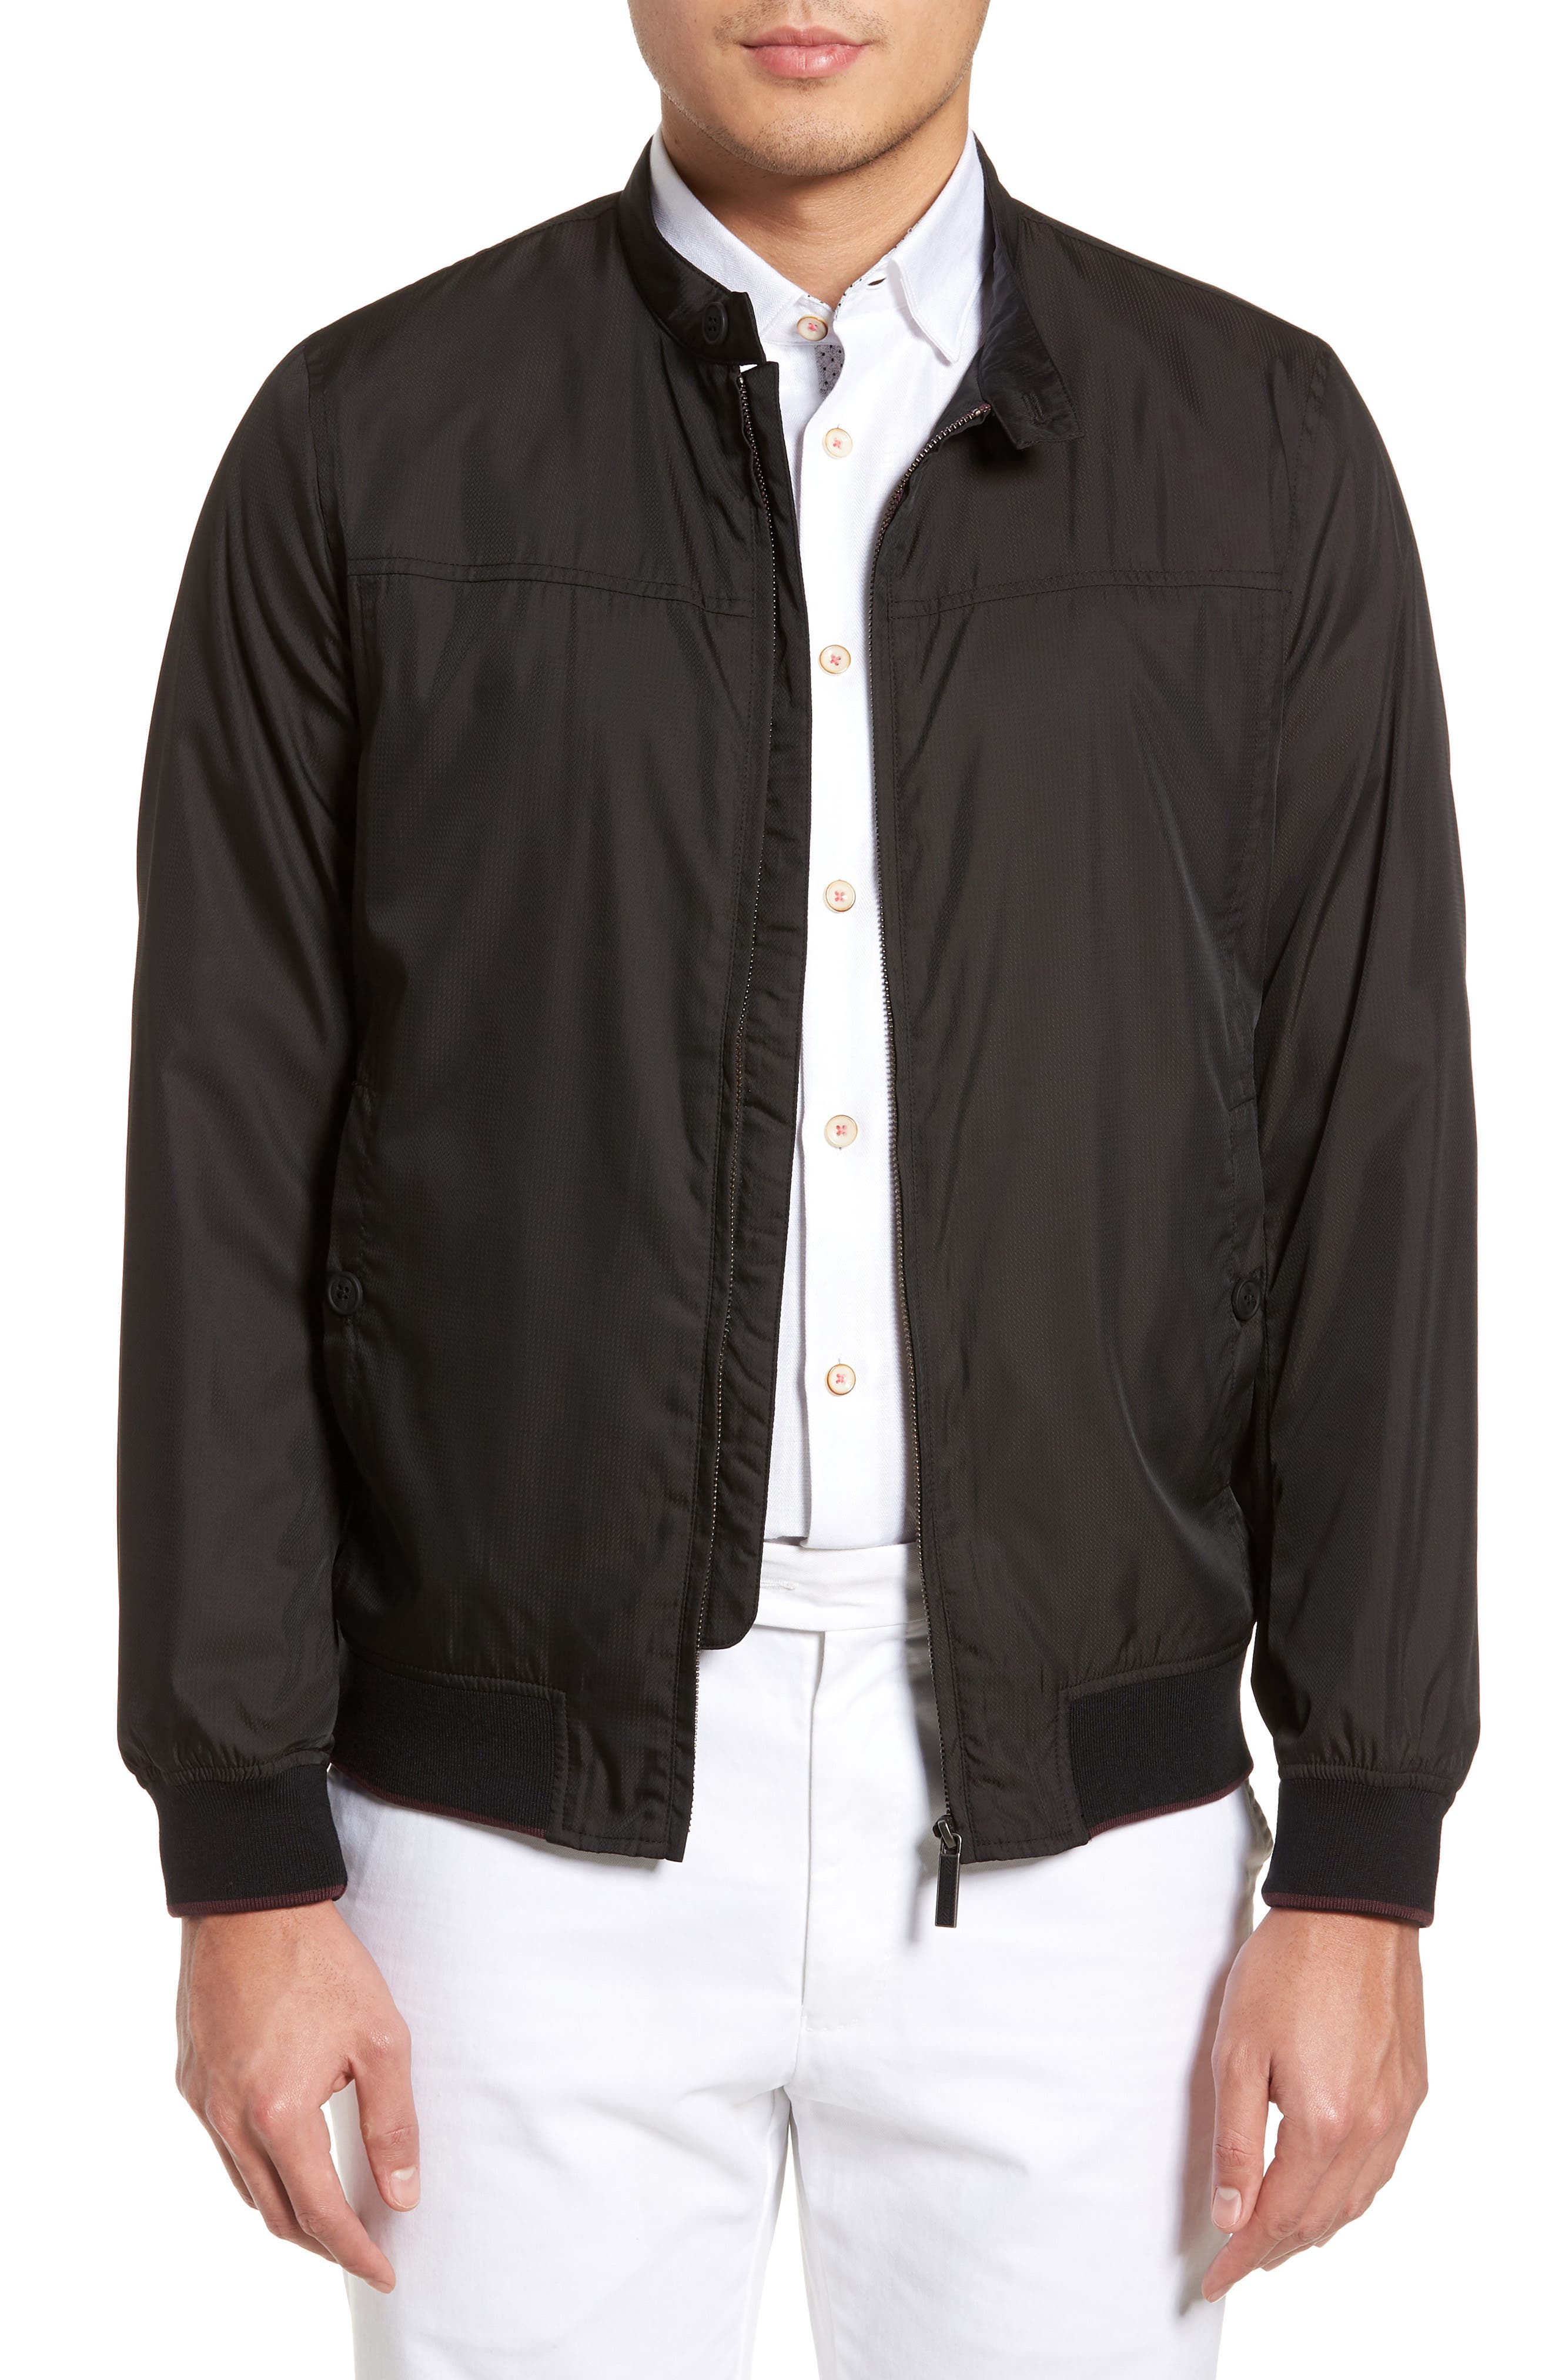 Calgar Nylon Bomber Jacket,                         Main,                         color, Black